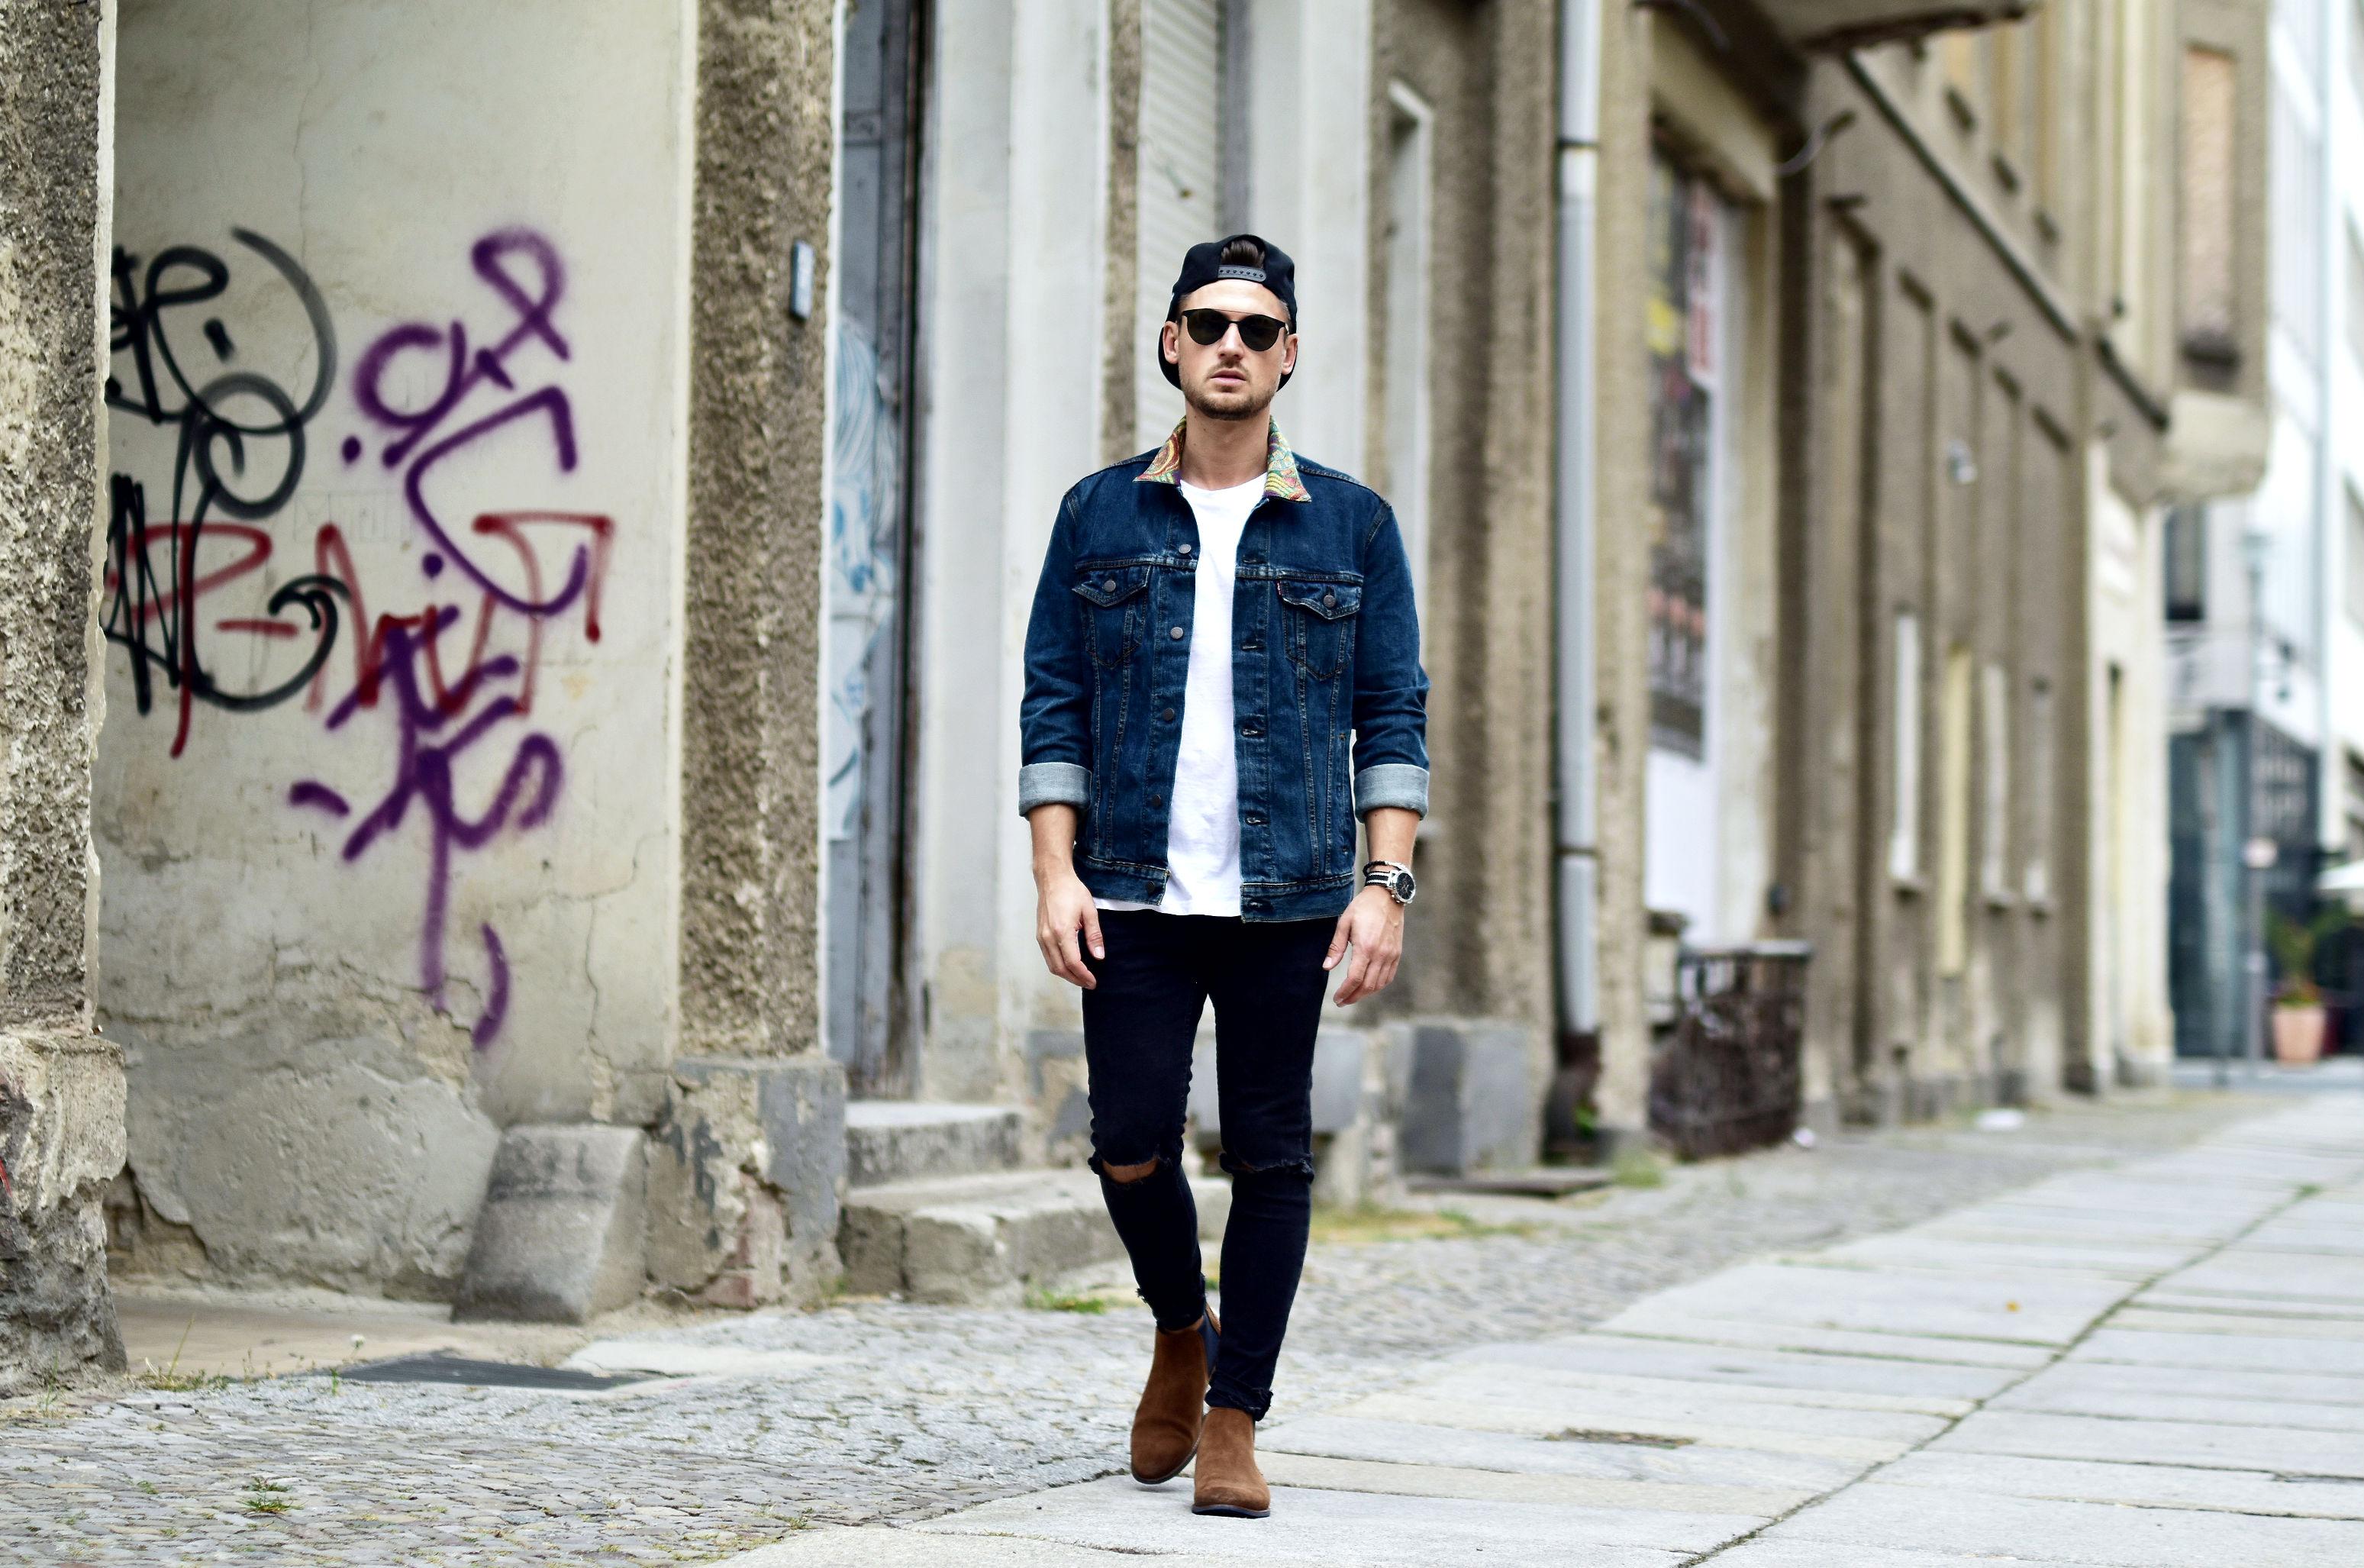 tommeezjerry-styleblog-maennerblog-maenner-modeblog-berlin-berlinblog-maennermodeblog-outfit-levis-customized-jeansjacke-thomas-sabo-schmuck-streetstyelook-berlin